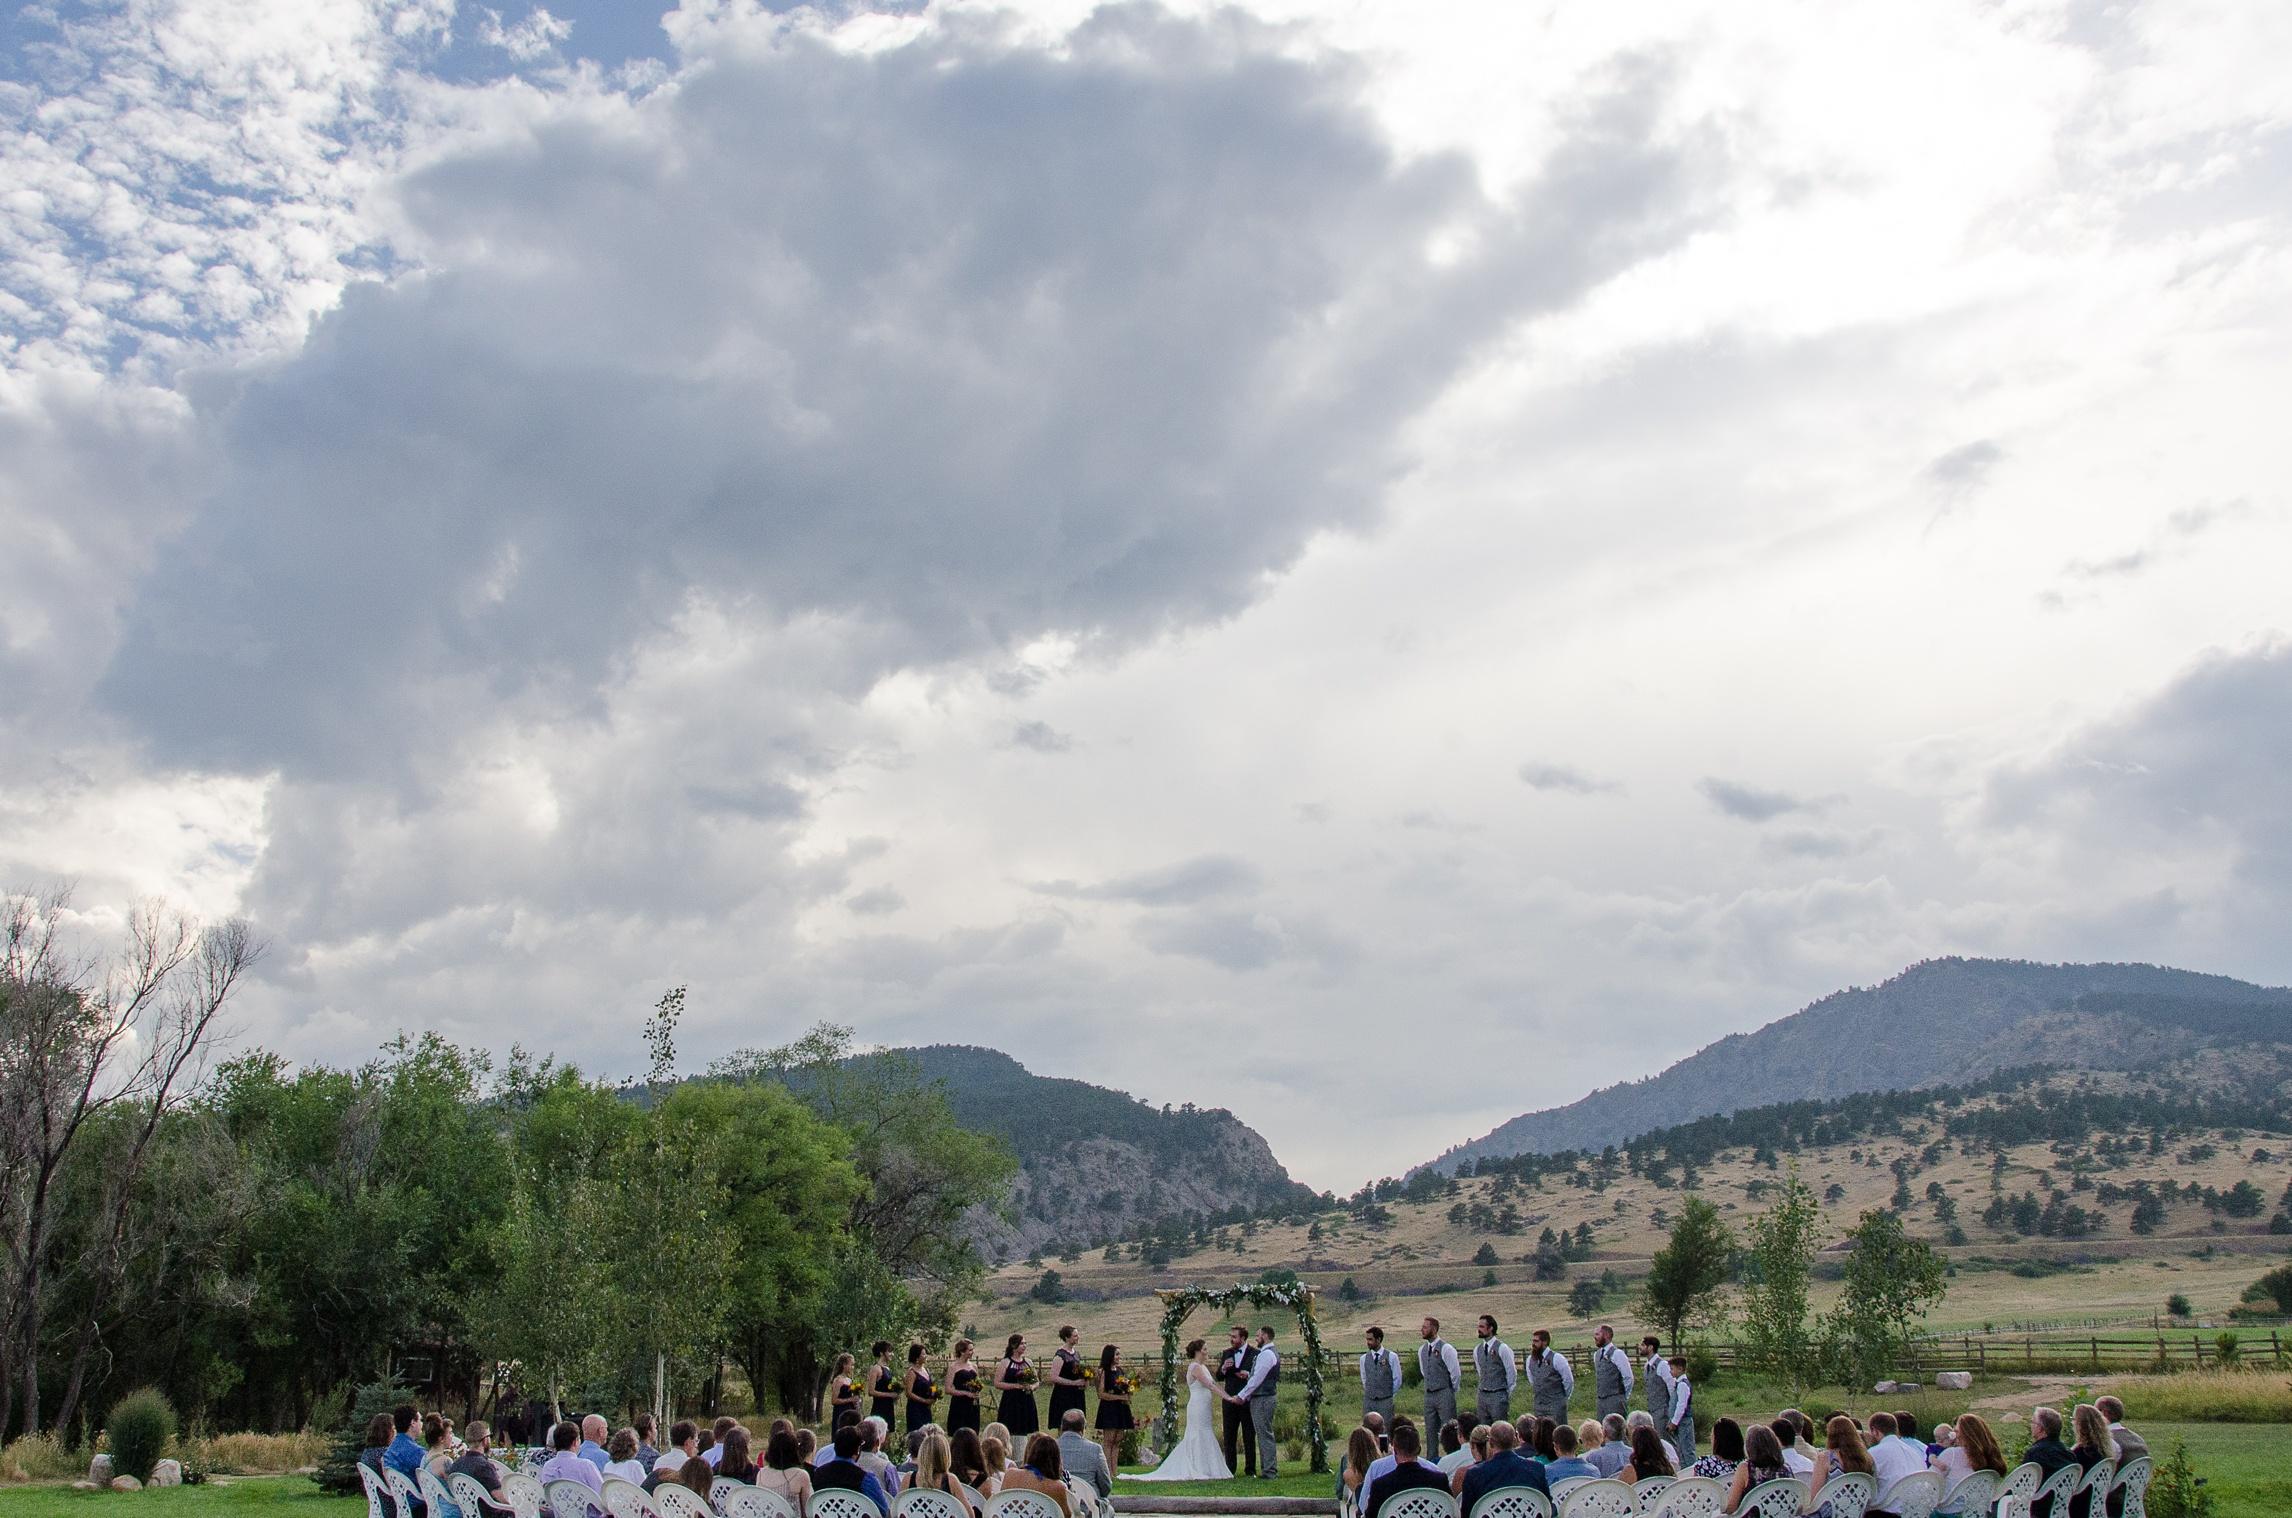 A summer wedding at Sylvan Dale Guest Ranch near Loveland, Colorado. Wedding photography by Max Salzburg of Sonja K Photography.